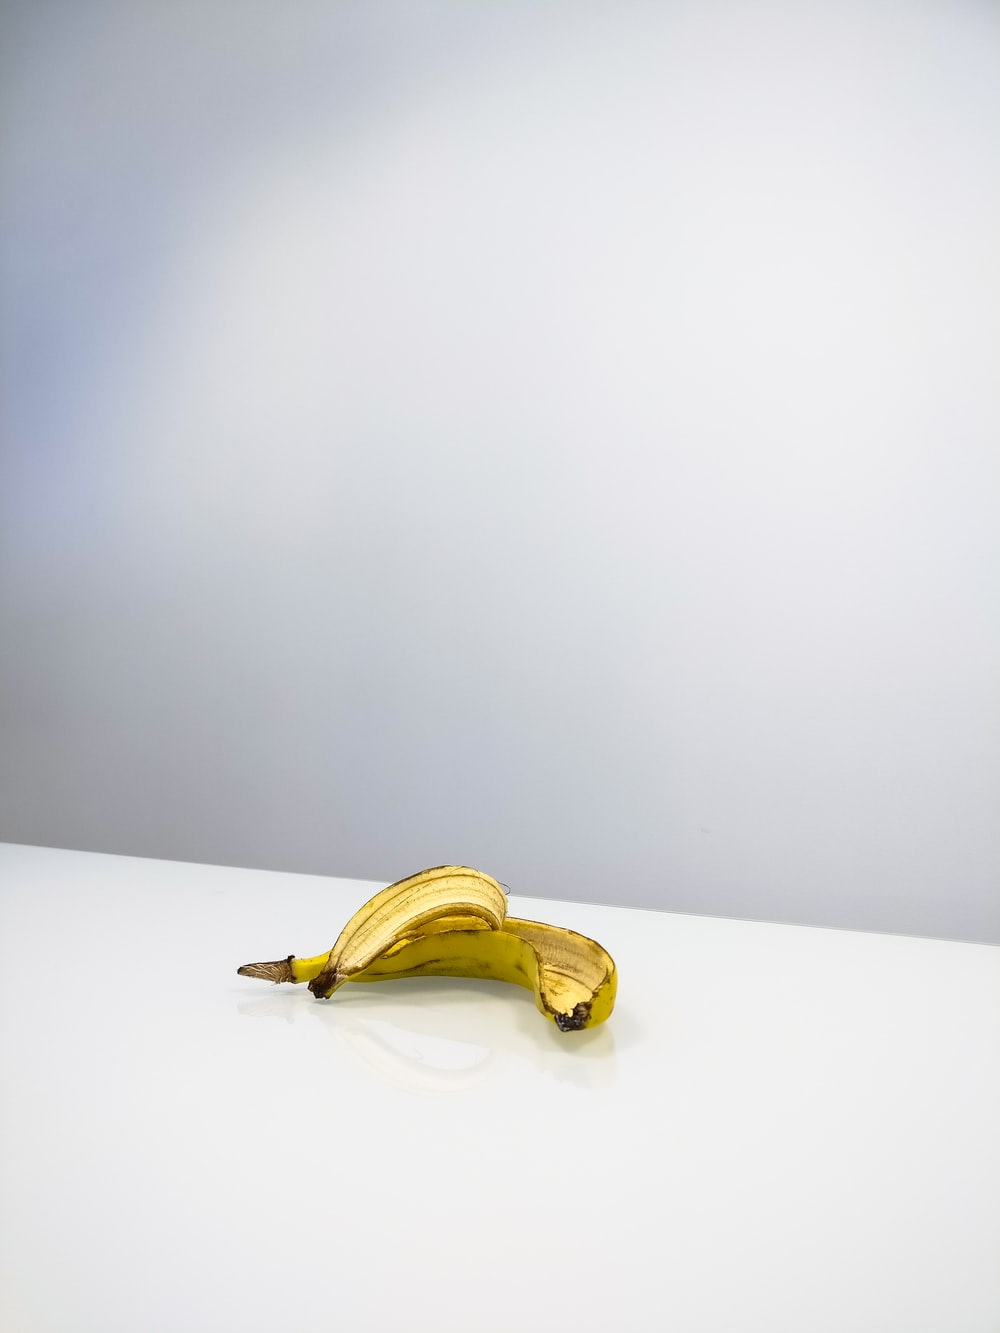 banana peel on table